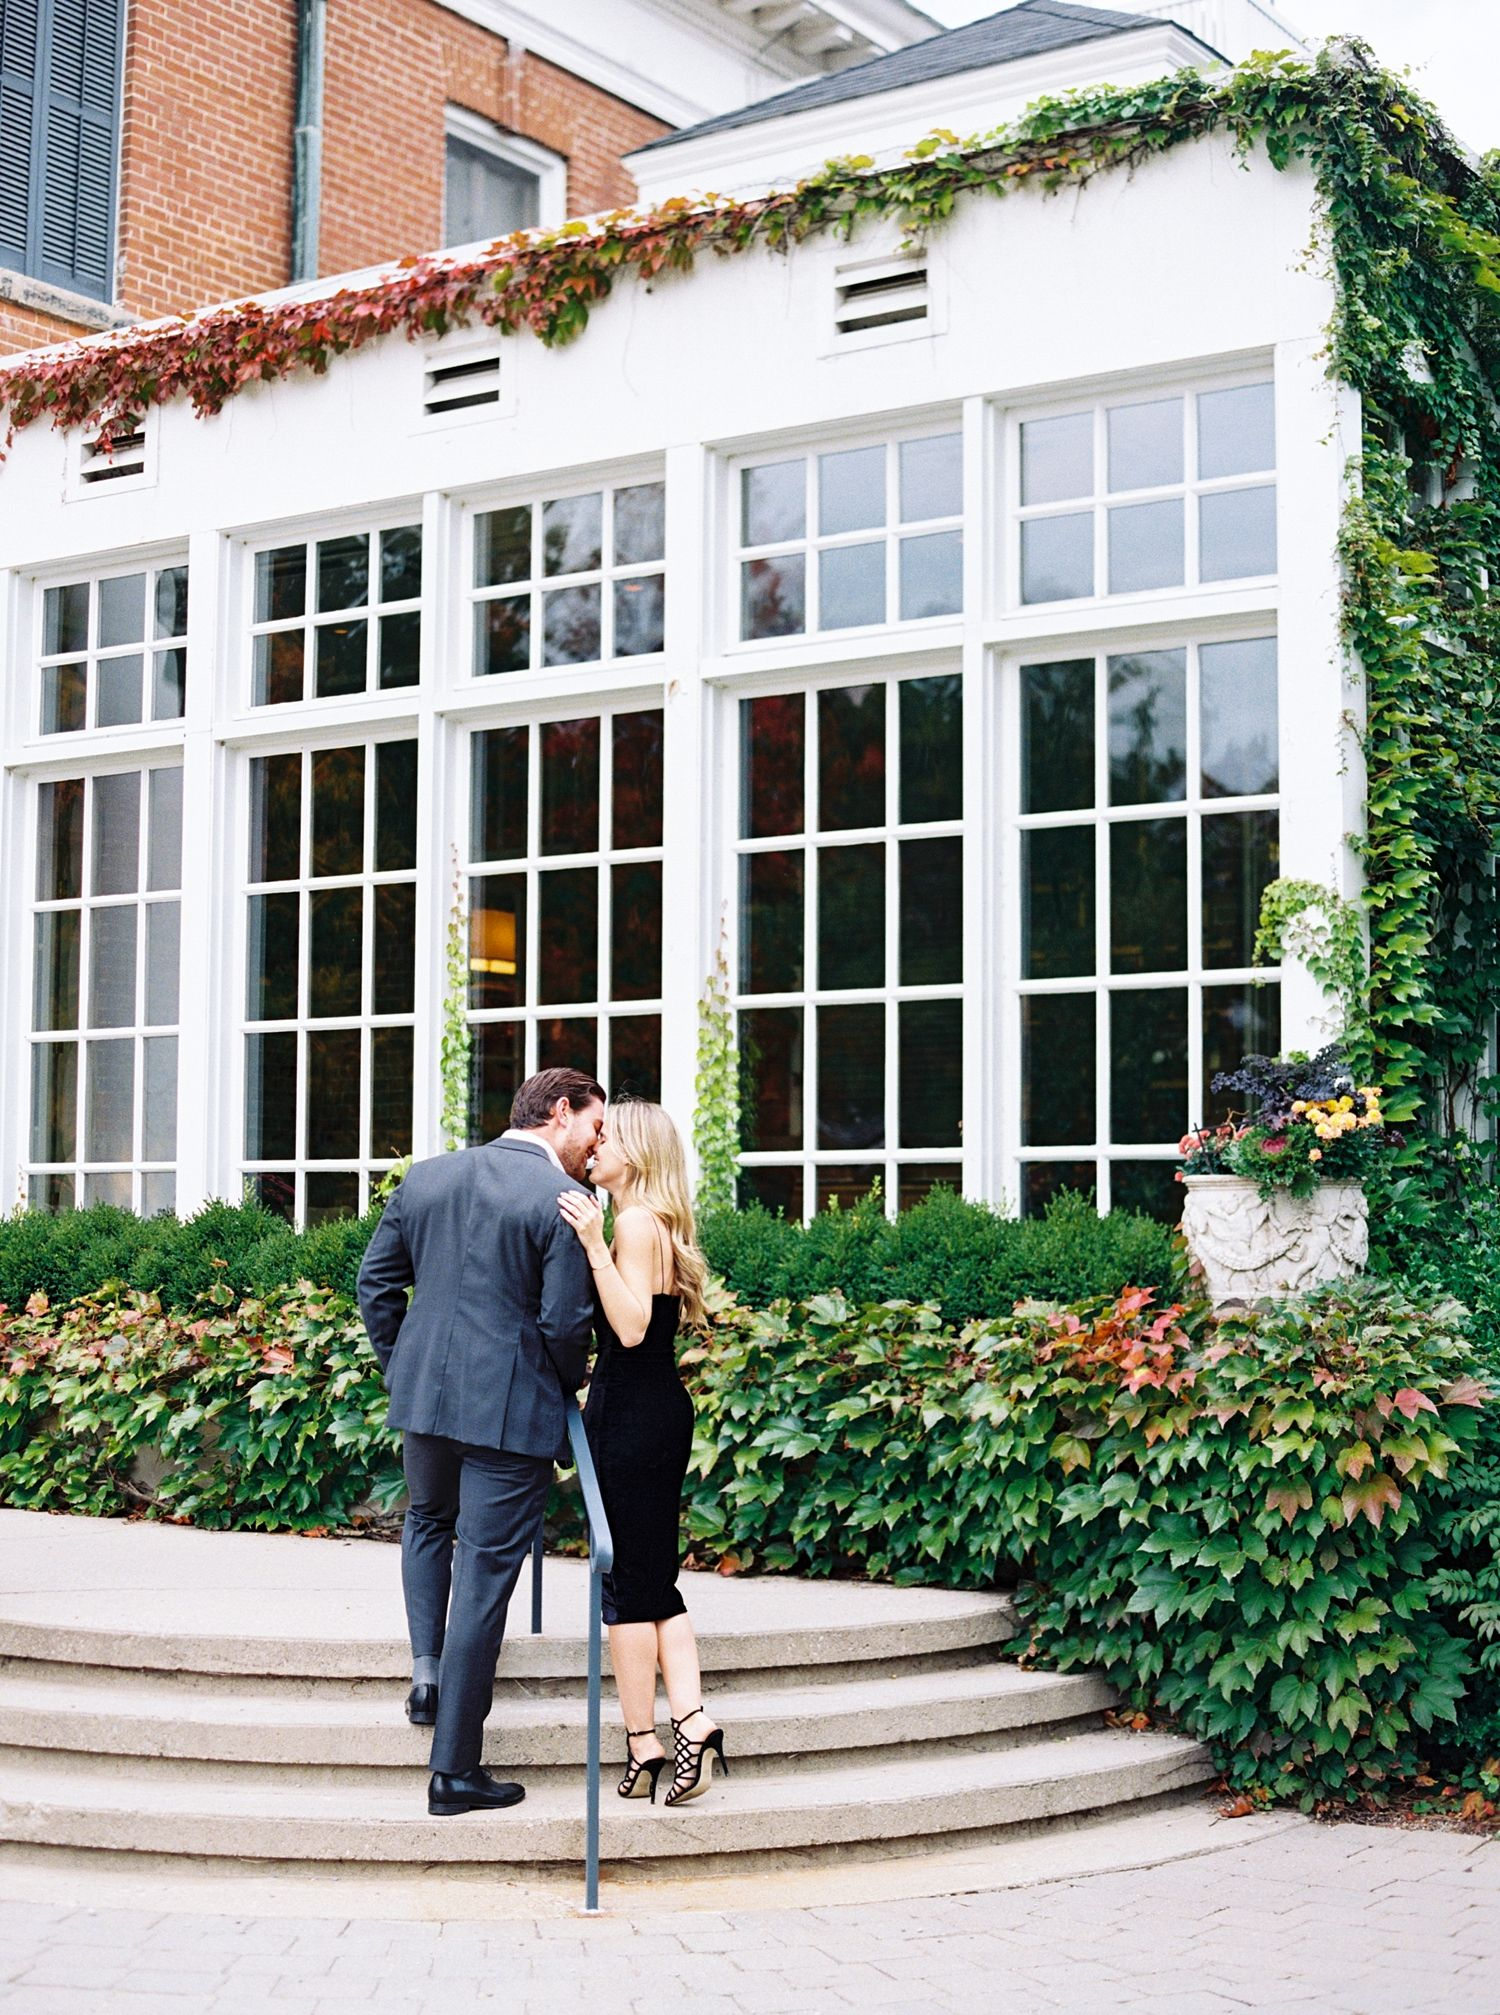 Hall Jennifer Chad O Langdon Proposal Photographer Cambridge Ontario Wedding Venue